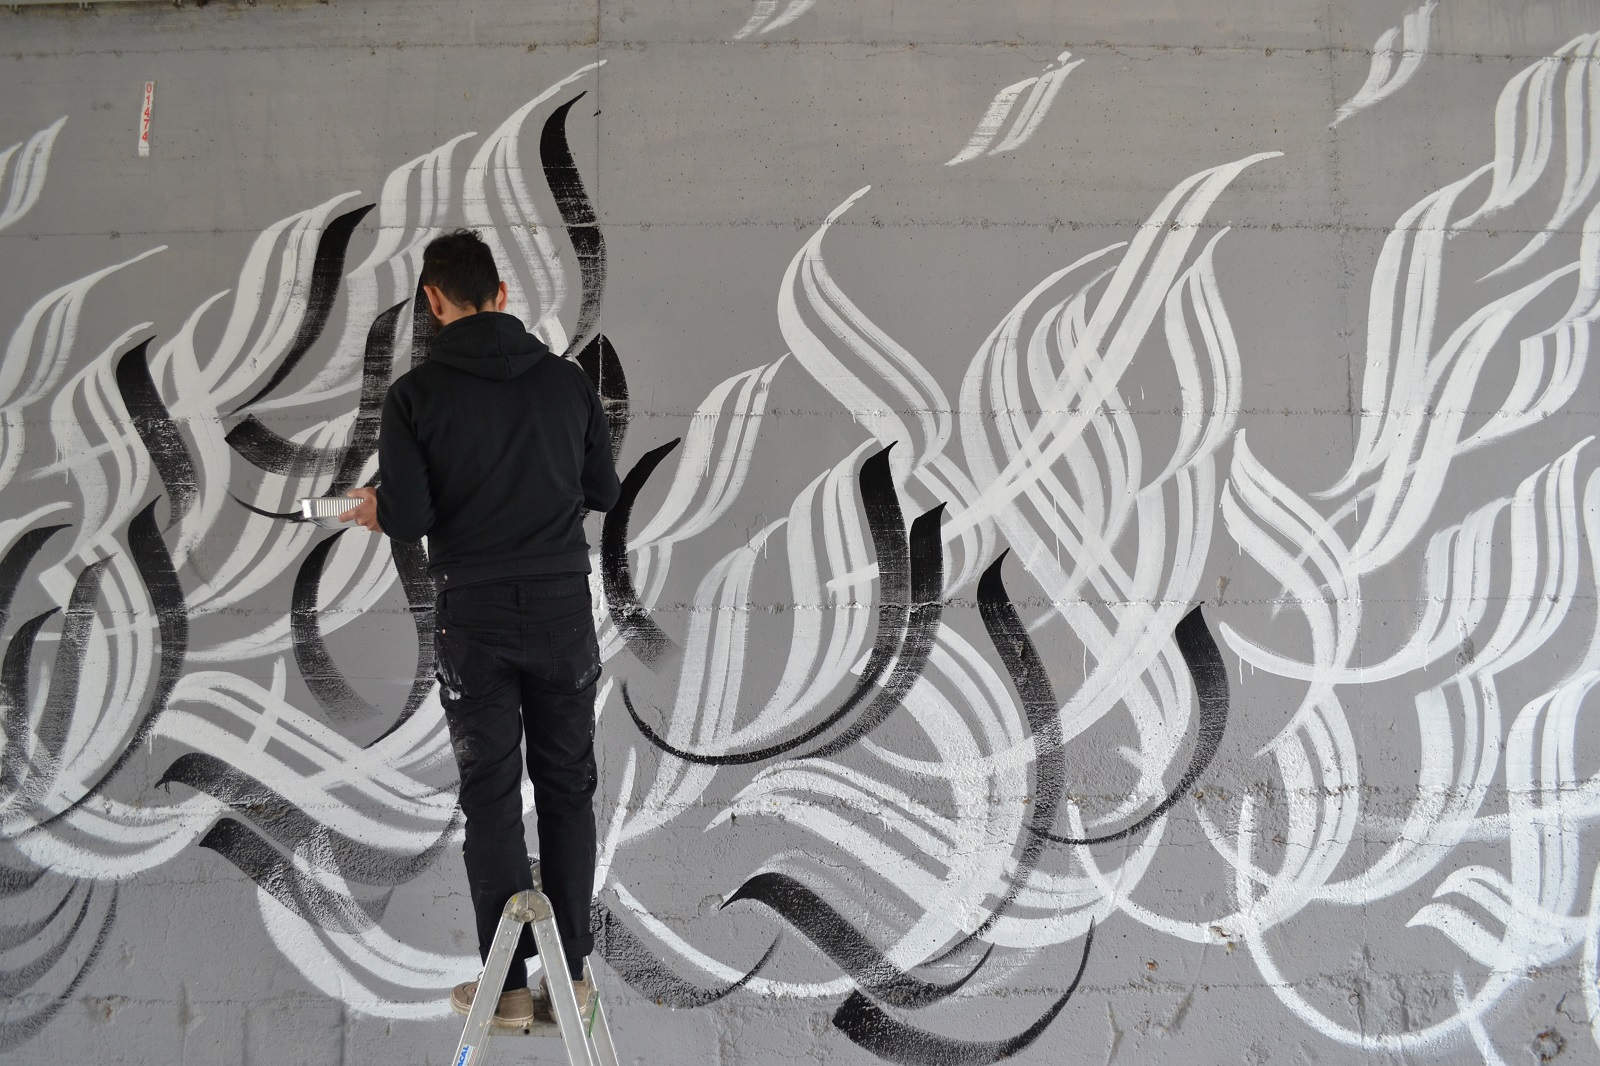 domenico-romeo-for-urban-canvas-in-varese-02